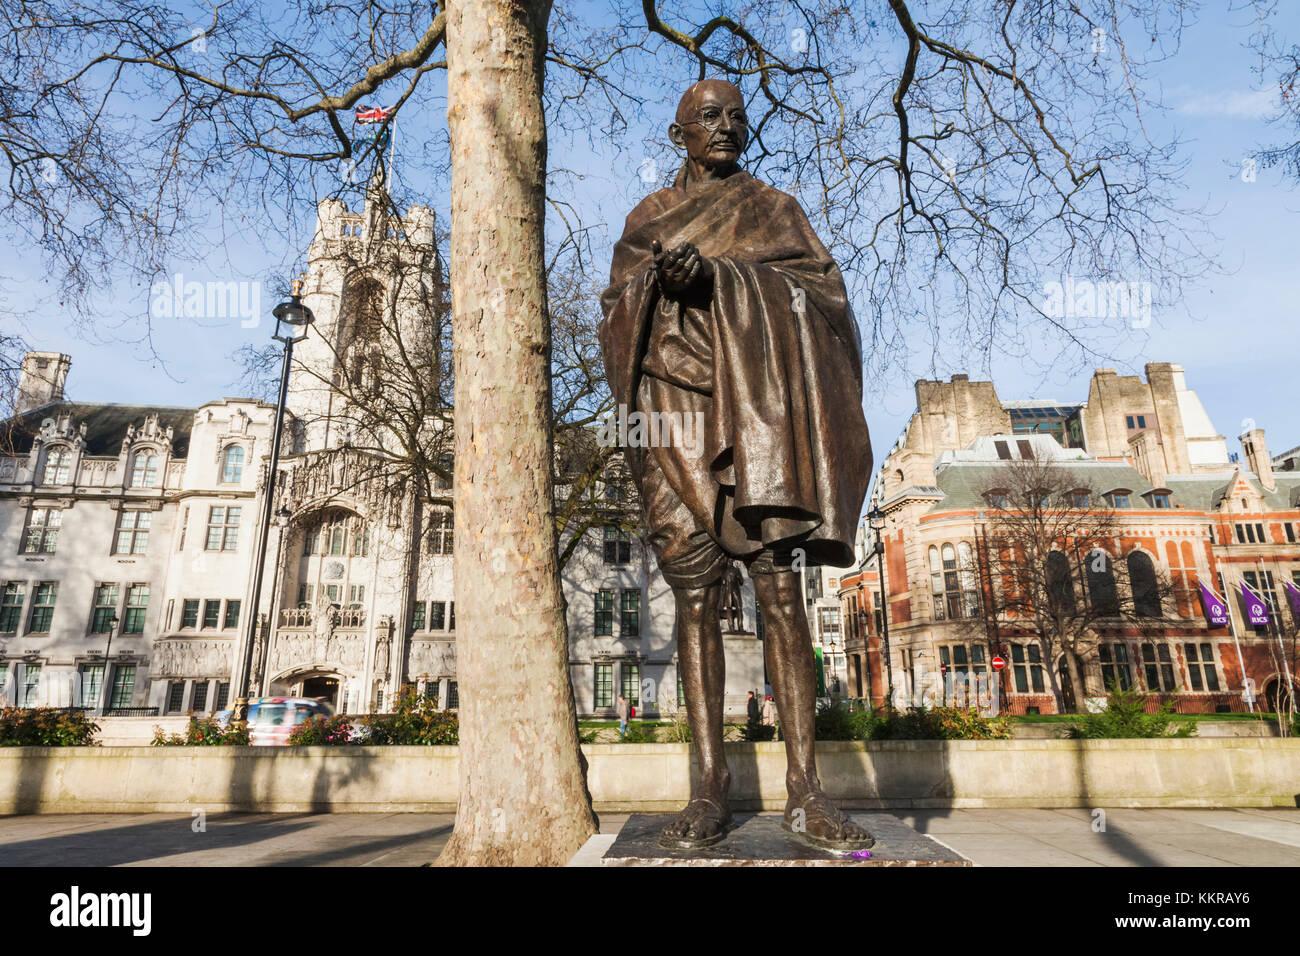 England, London, Westminster, Mahatma Gandhi Statue by Philip Jackson - Stock Image